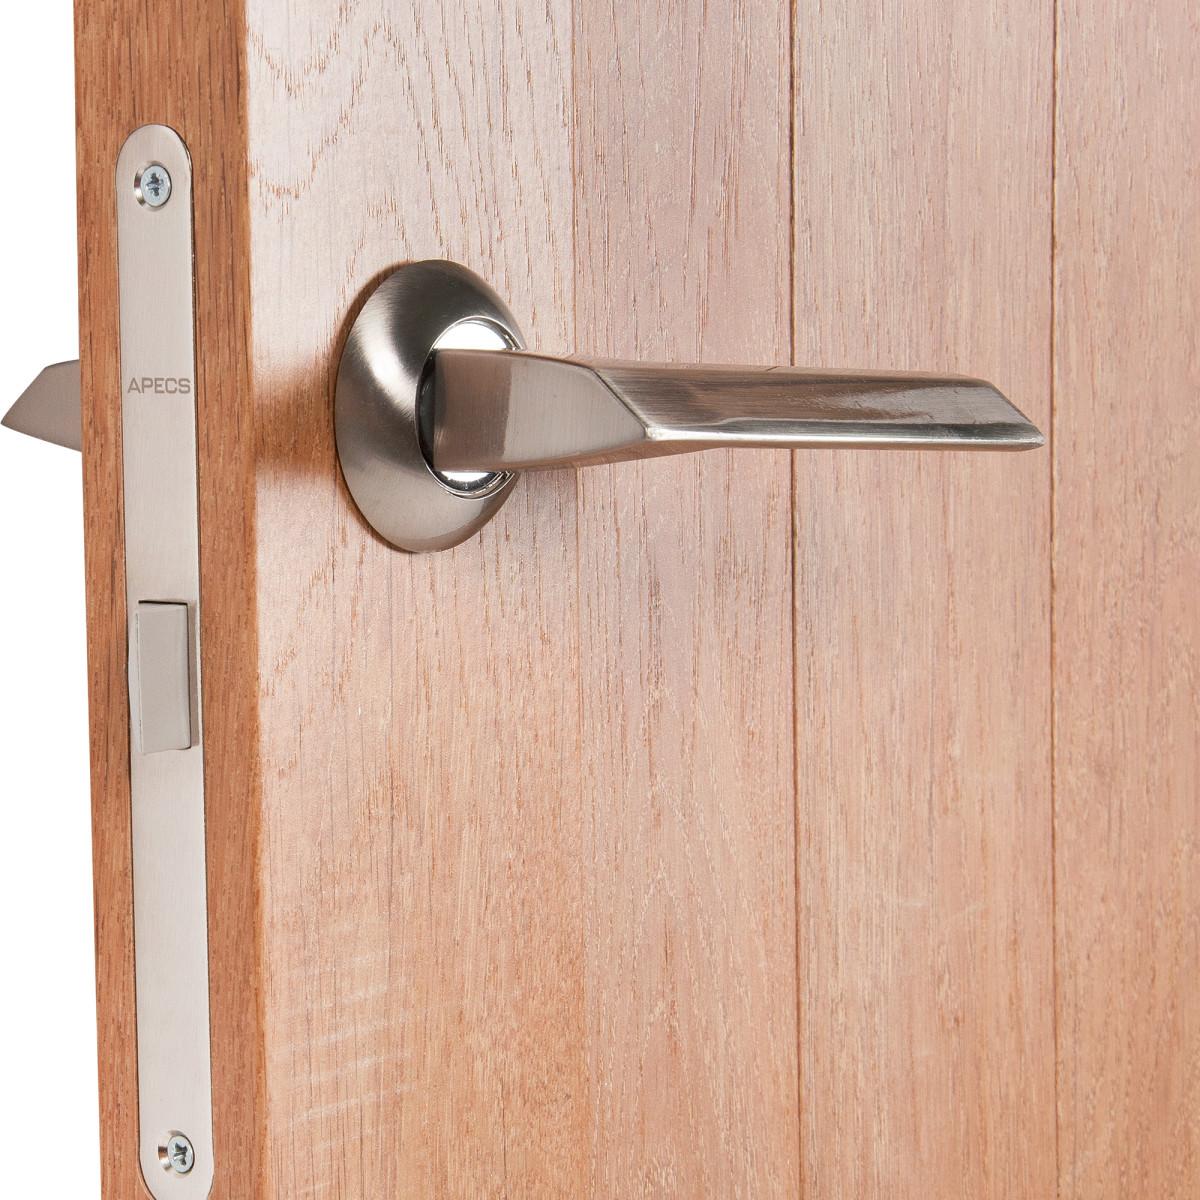 Дверь Межкомнатная Глухая Кантри 80x200 Пвх Цвет Дуб Арагон С Фурнитурой